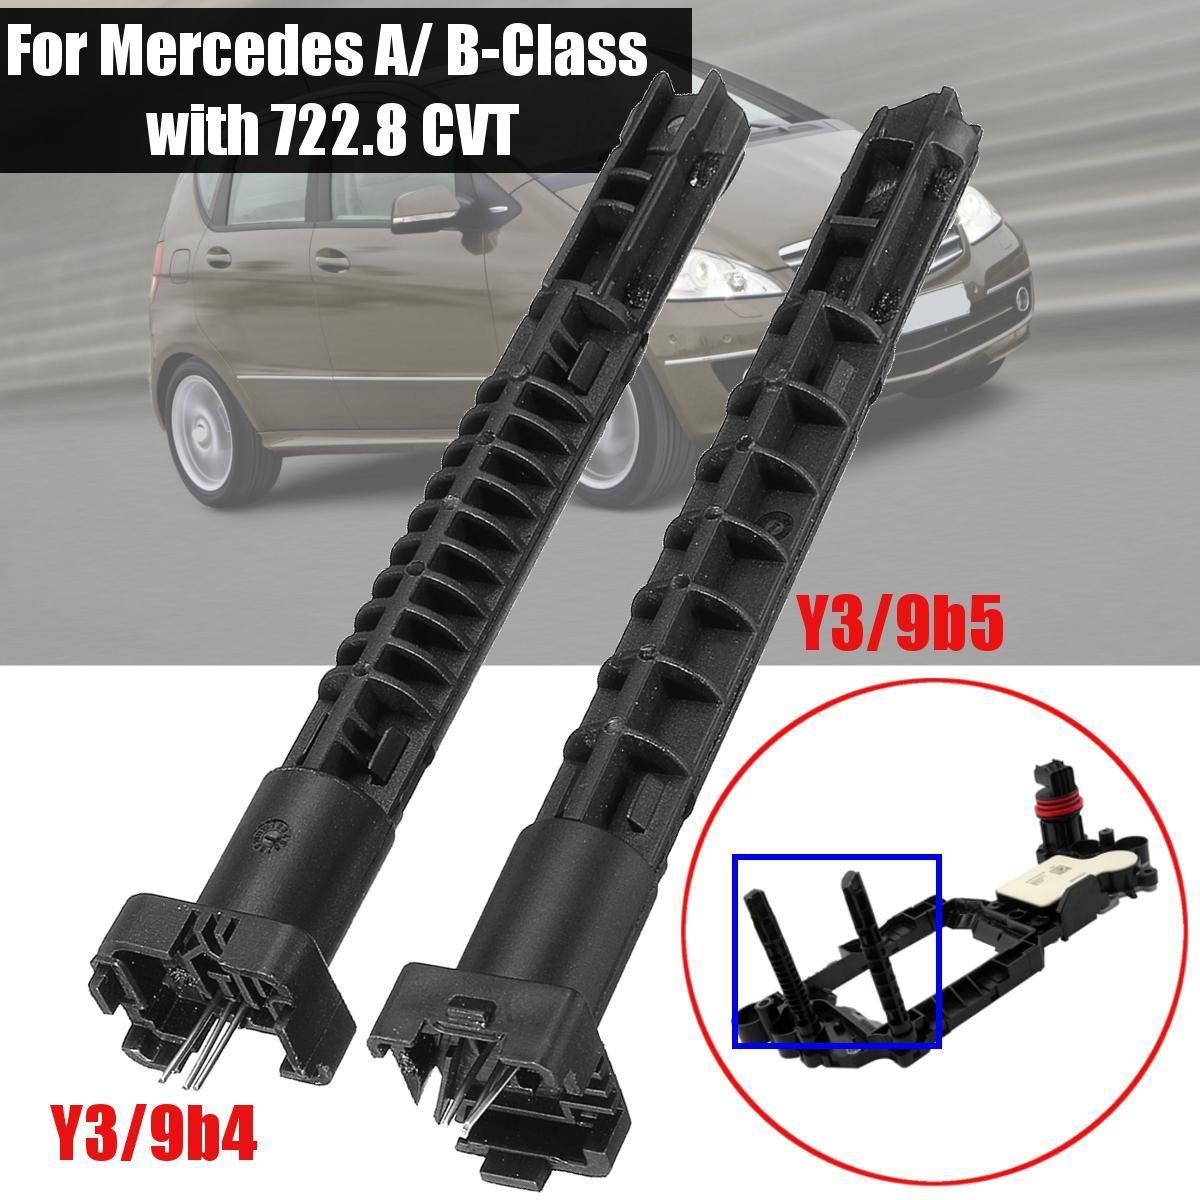 Control Module Sensor for Mercedes-Benz TCM Gearbox Transmission Y3/9B4 And Y3/9B5 Black Speed 0002704200